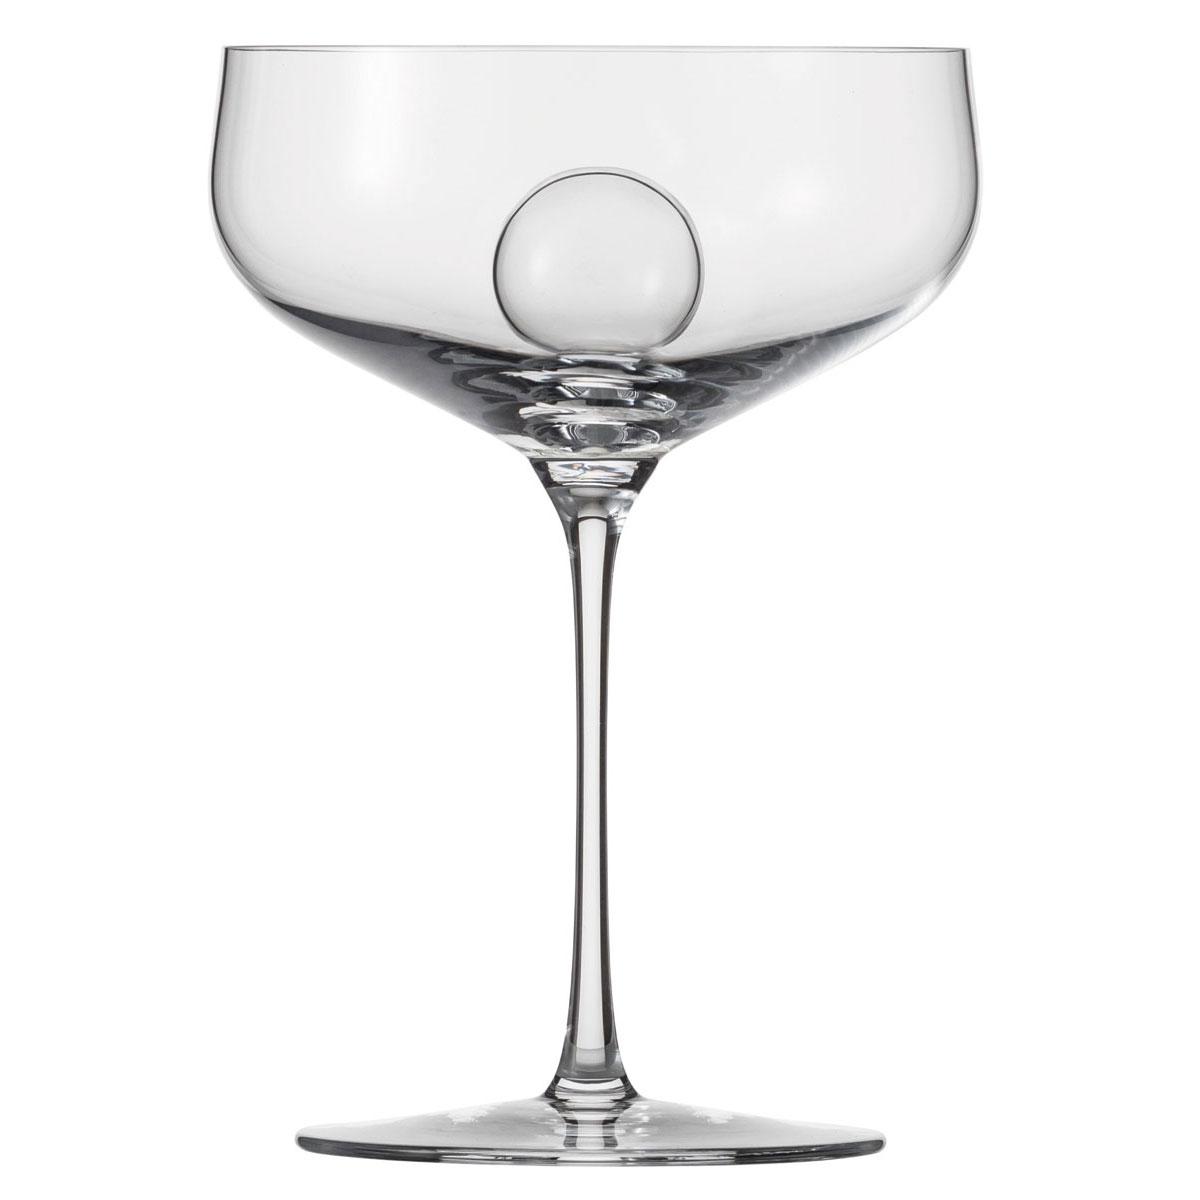 Schott Zwiesel Tritan Crystal, 1872 Air Sense Saucer Crystal Champagne Glass, Single